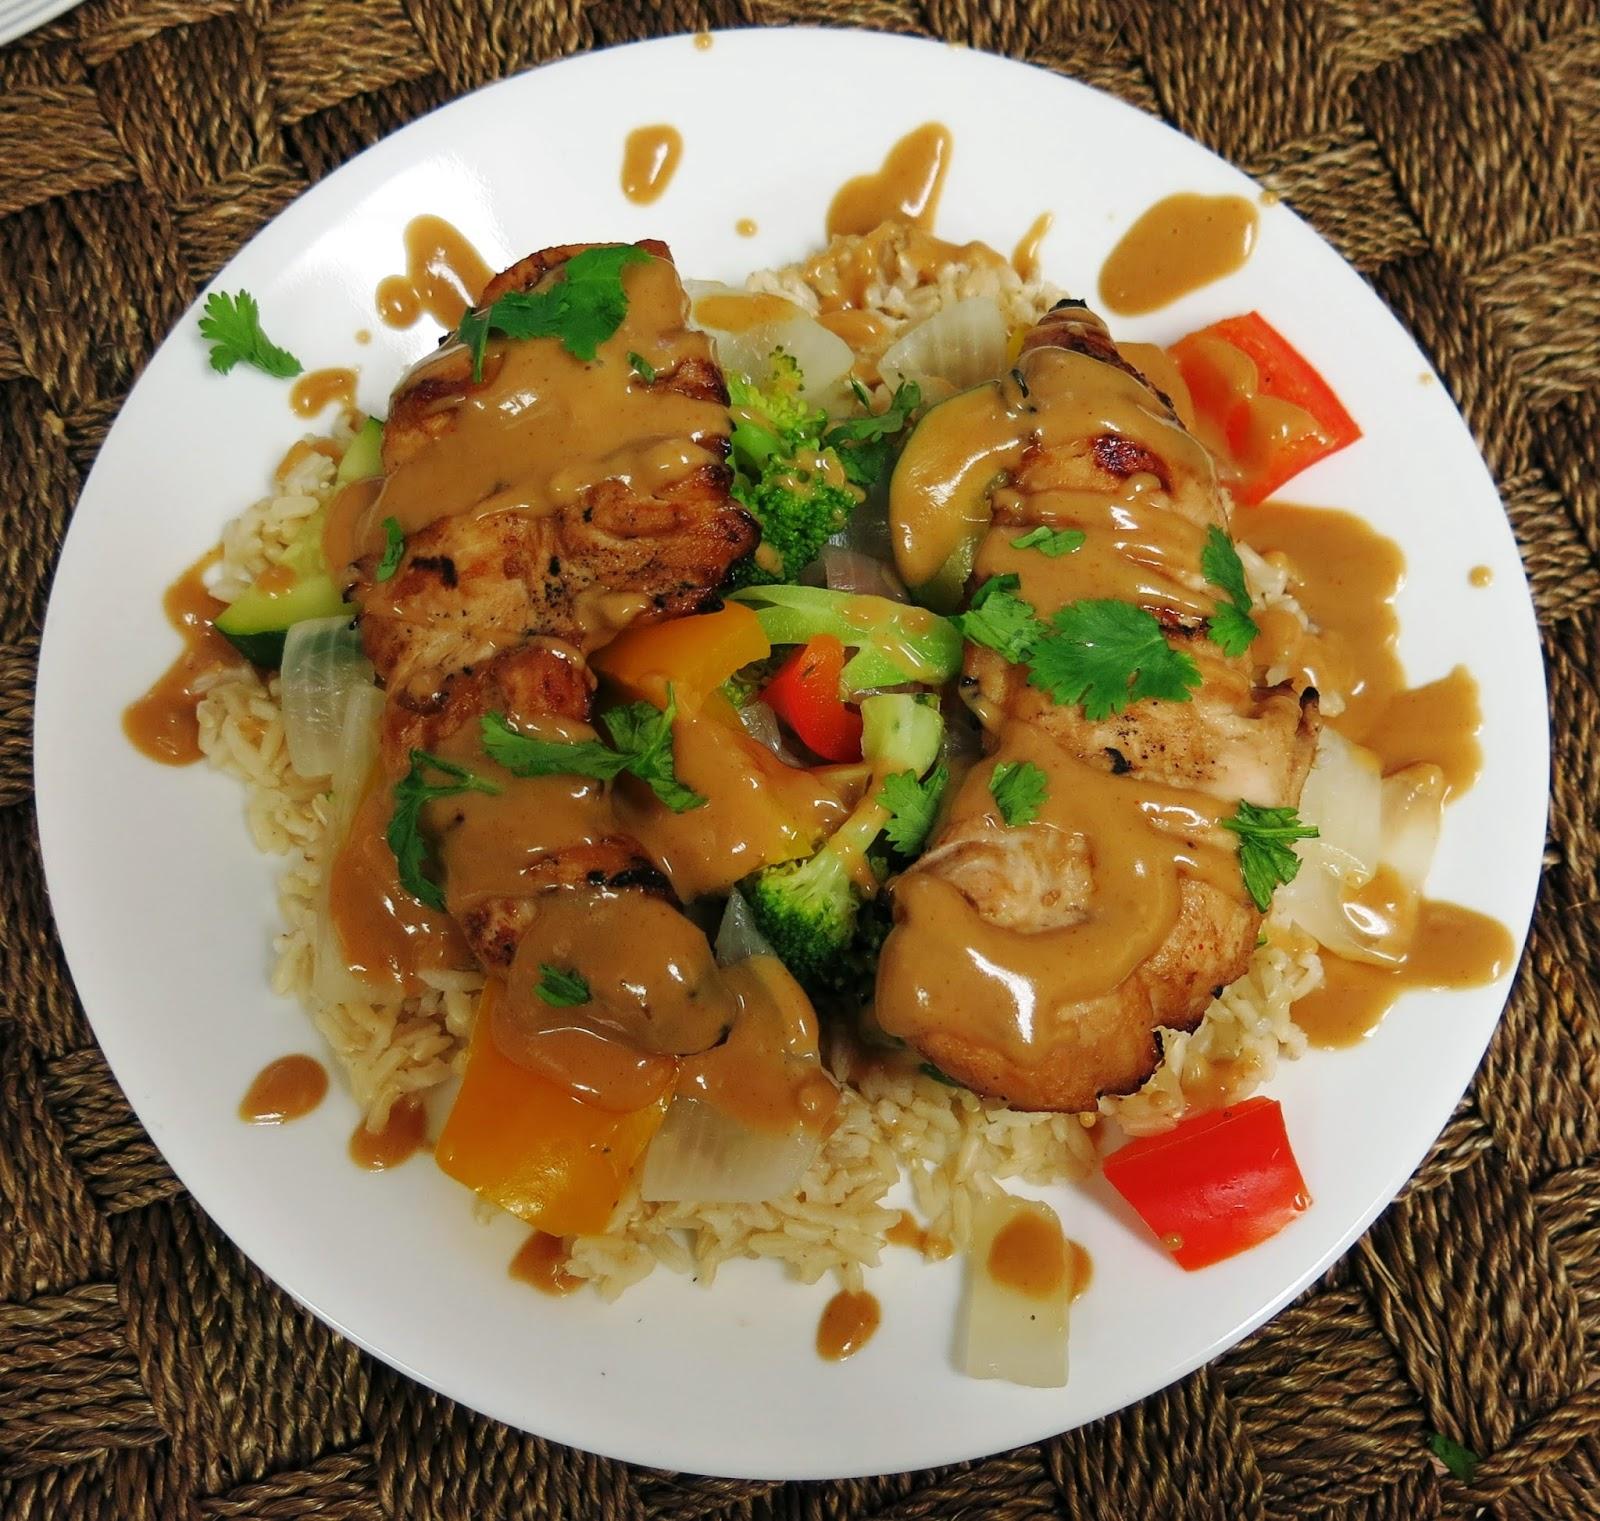 ... & Low Calorie: Grilled Chicken Tenderloins with Zesty Peanut Sauce